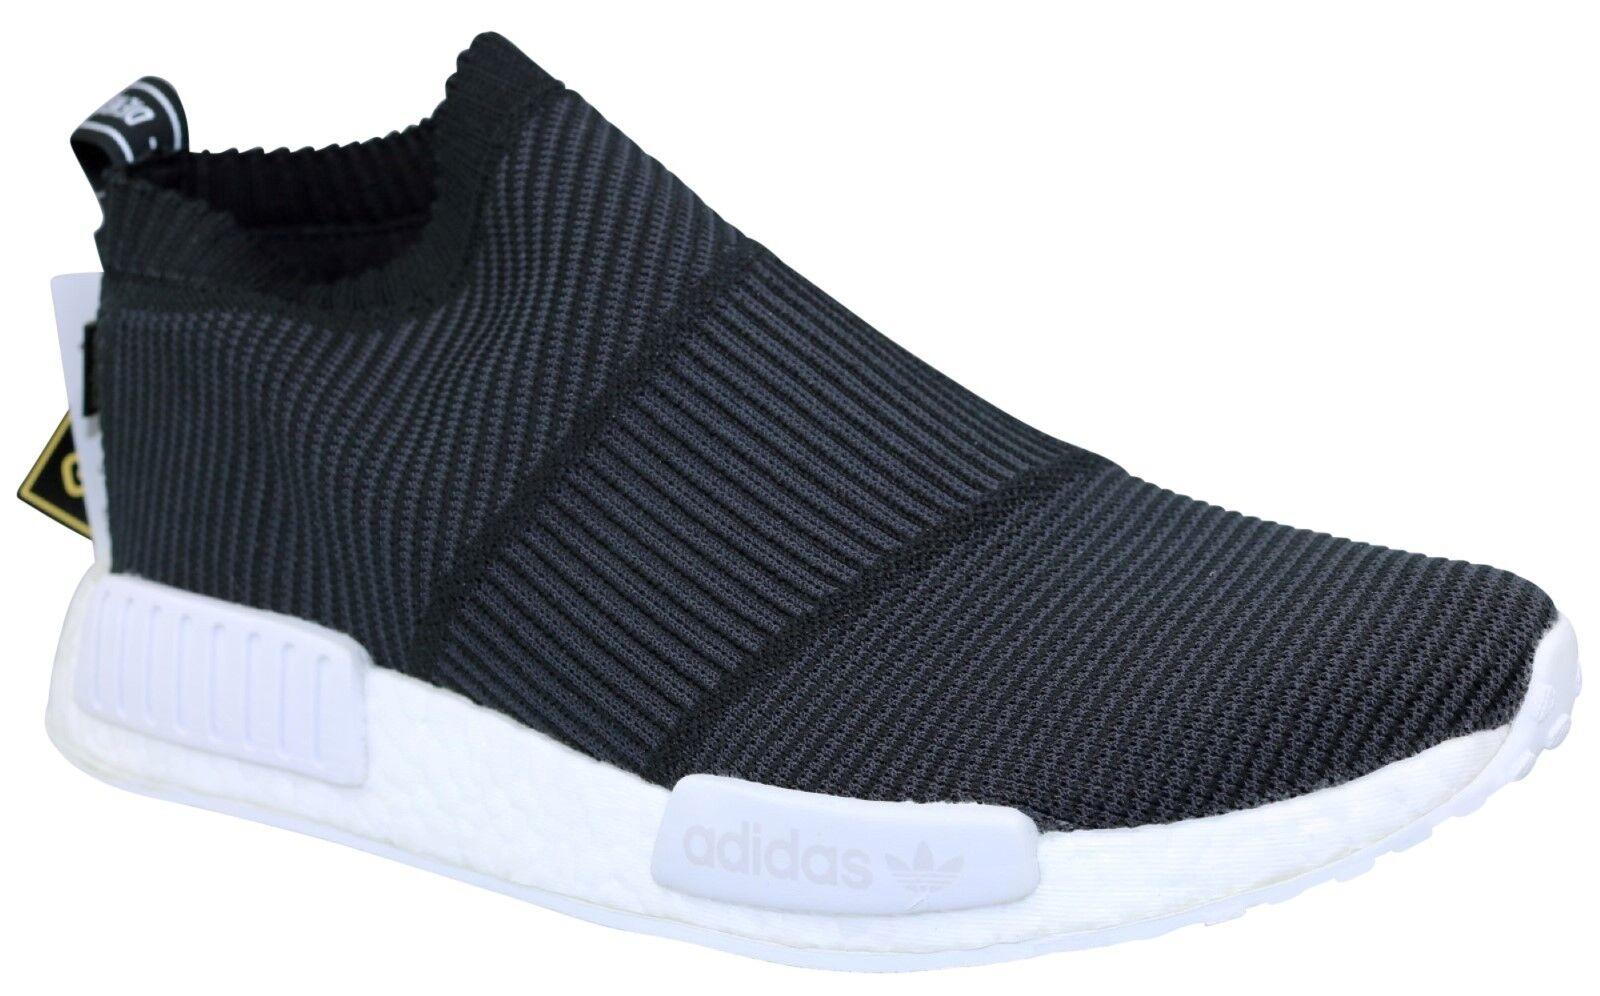 76d52f027472 ... order adidas originals tubular shadow ck baskets chaussures homme homme  chaussures noir cq0930 neuf 6f35b5 6995b